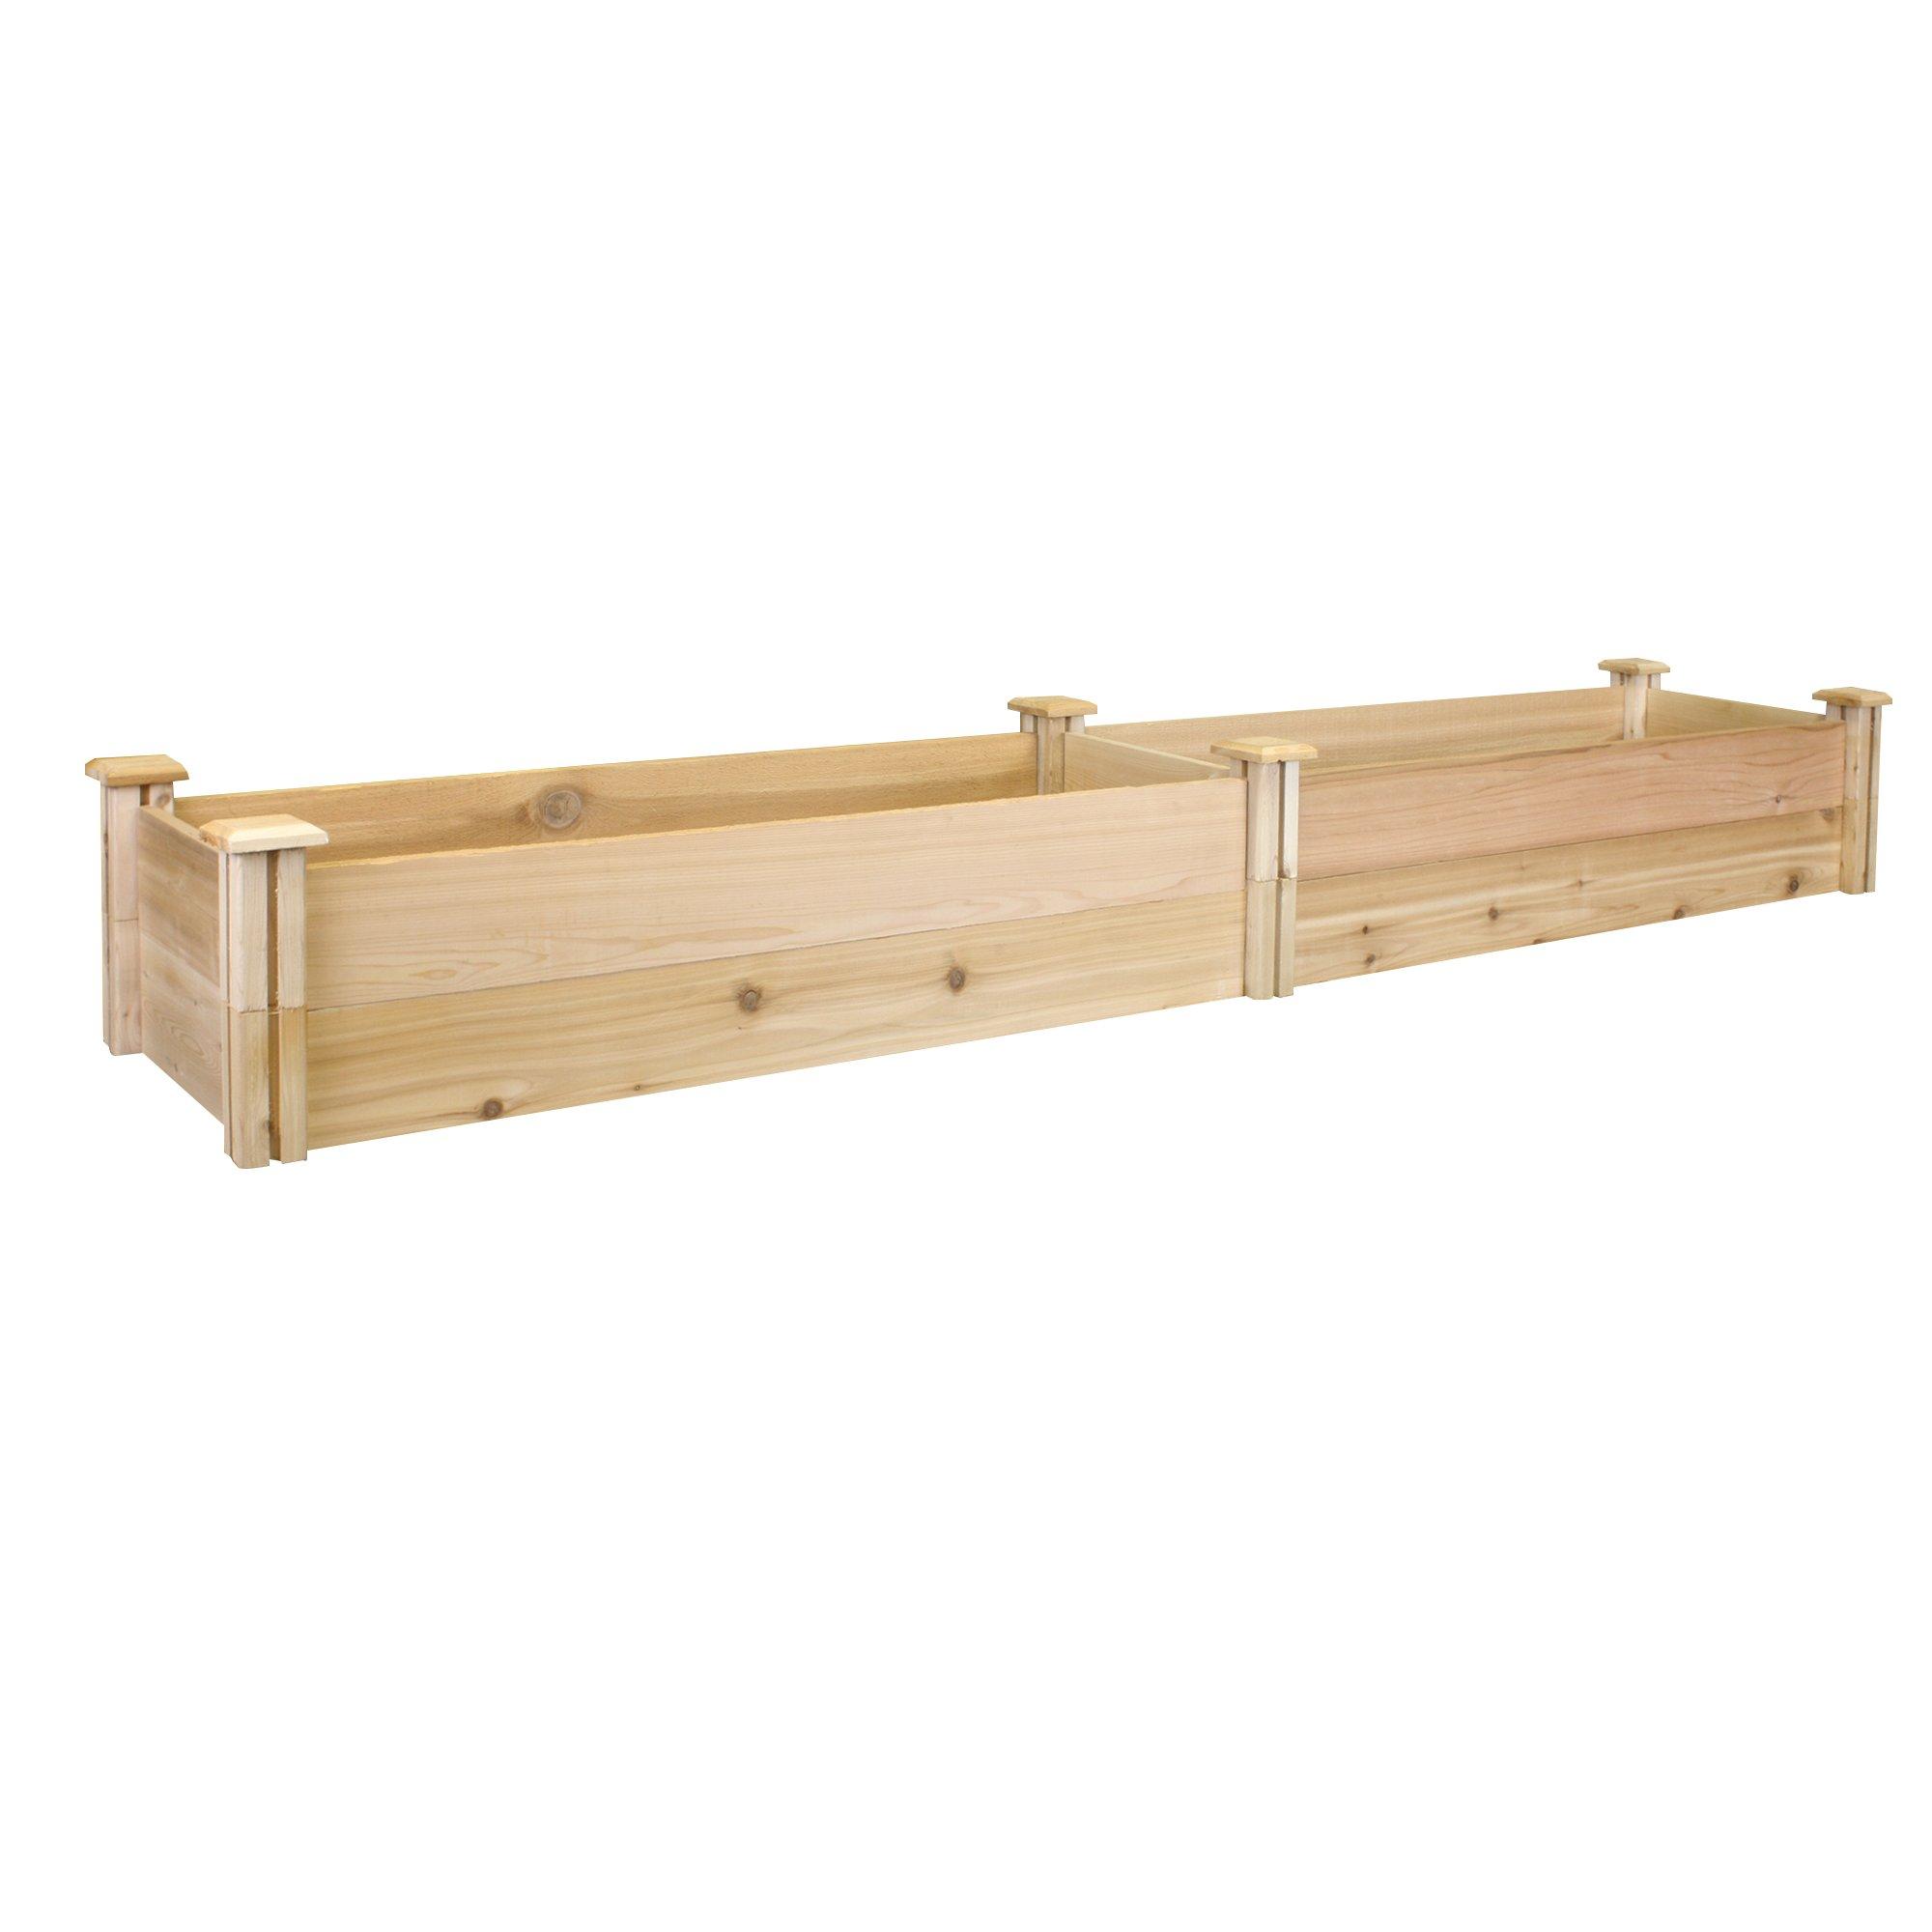 Greenes Fence Premium Cedar Raised Garden Bed, 16'' x 96'' x 11''